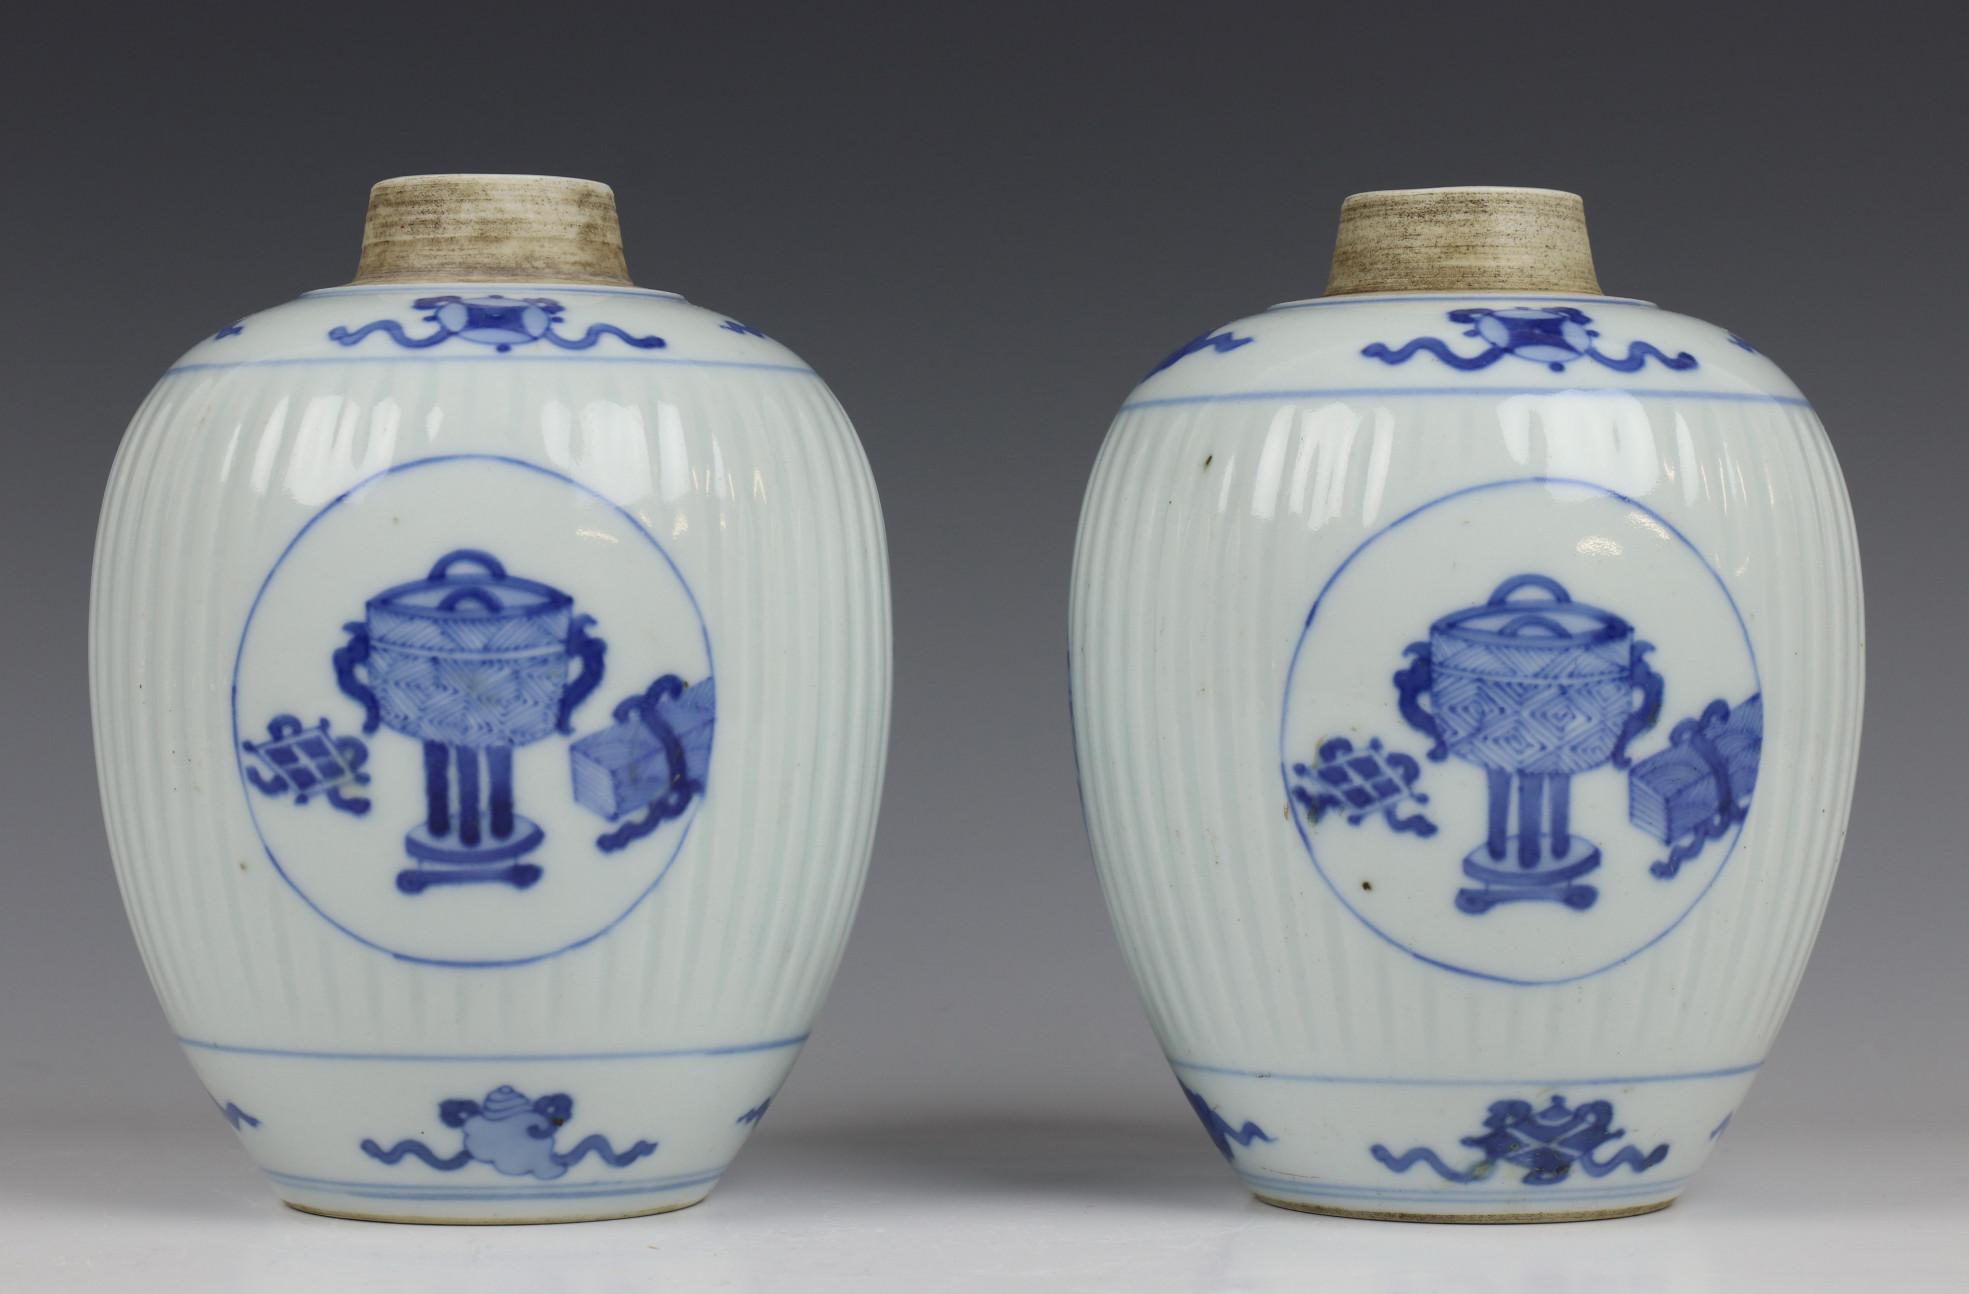 China, paar blauw-wit porseleinen gemberpotten in Kangxi stijl, - Image 2 of 5